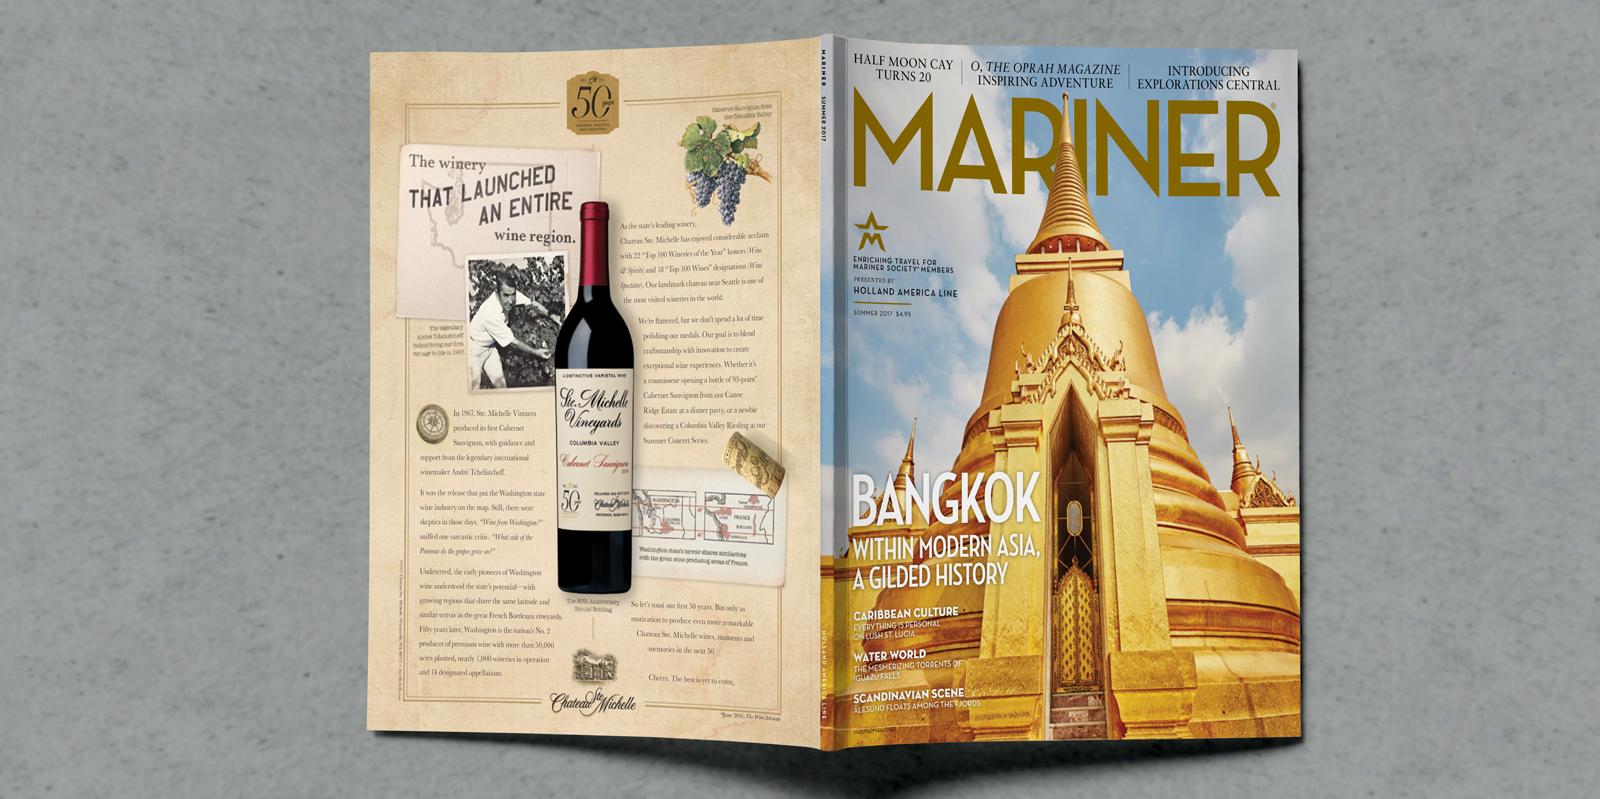 Mariner-Magazine-Front-Back-Covers.jpg